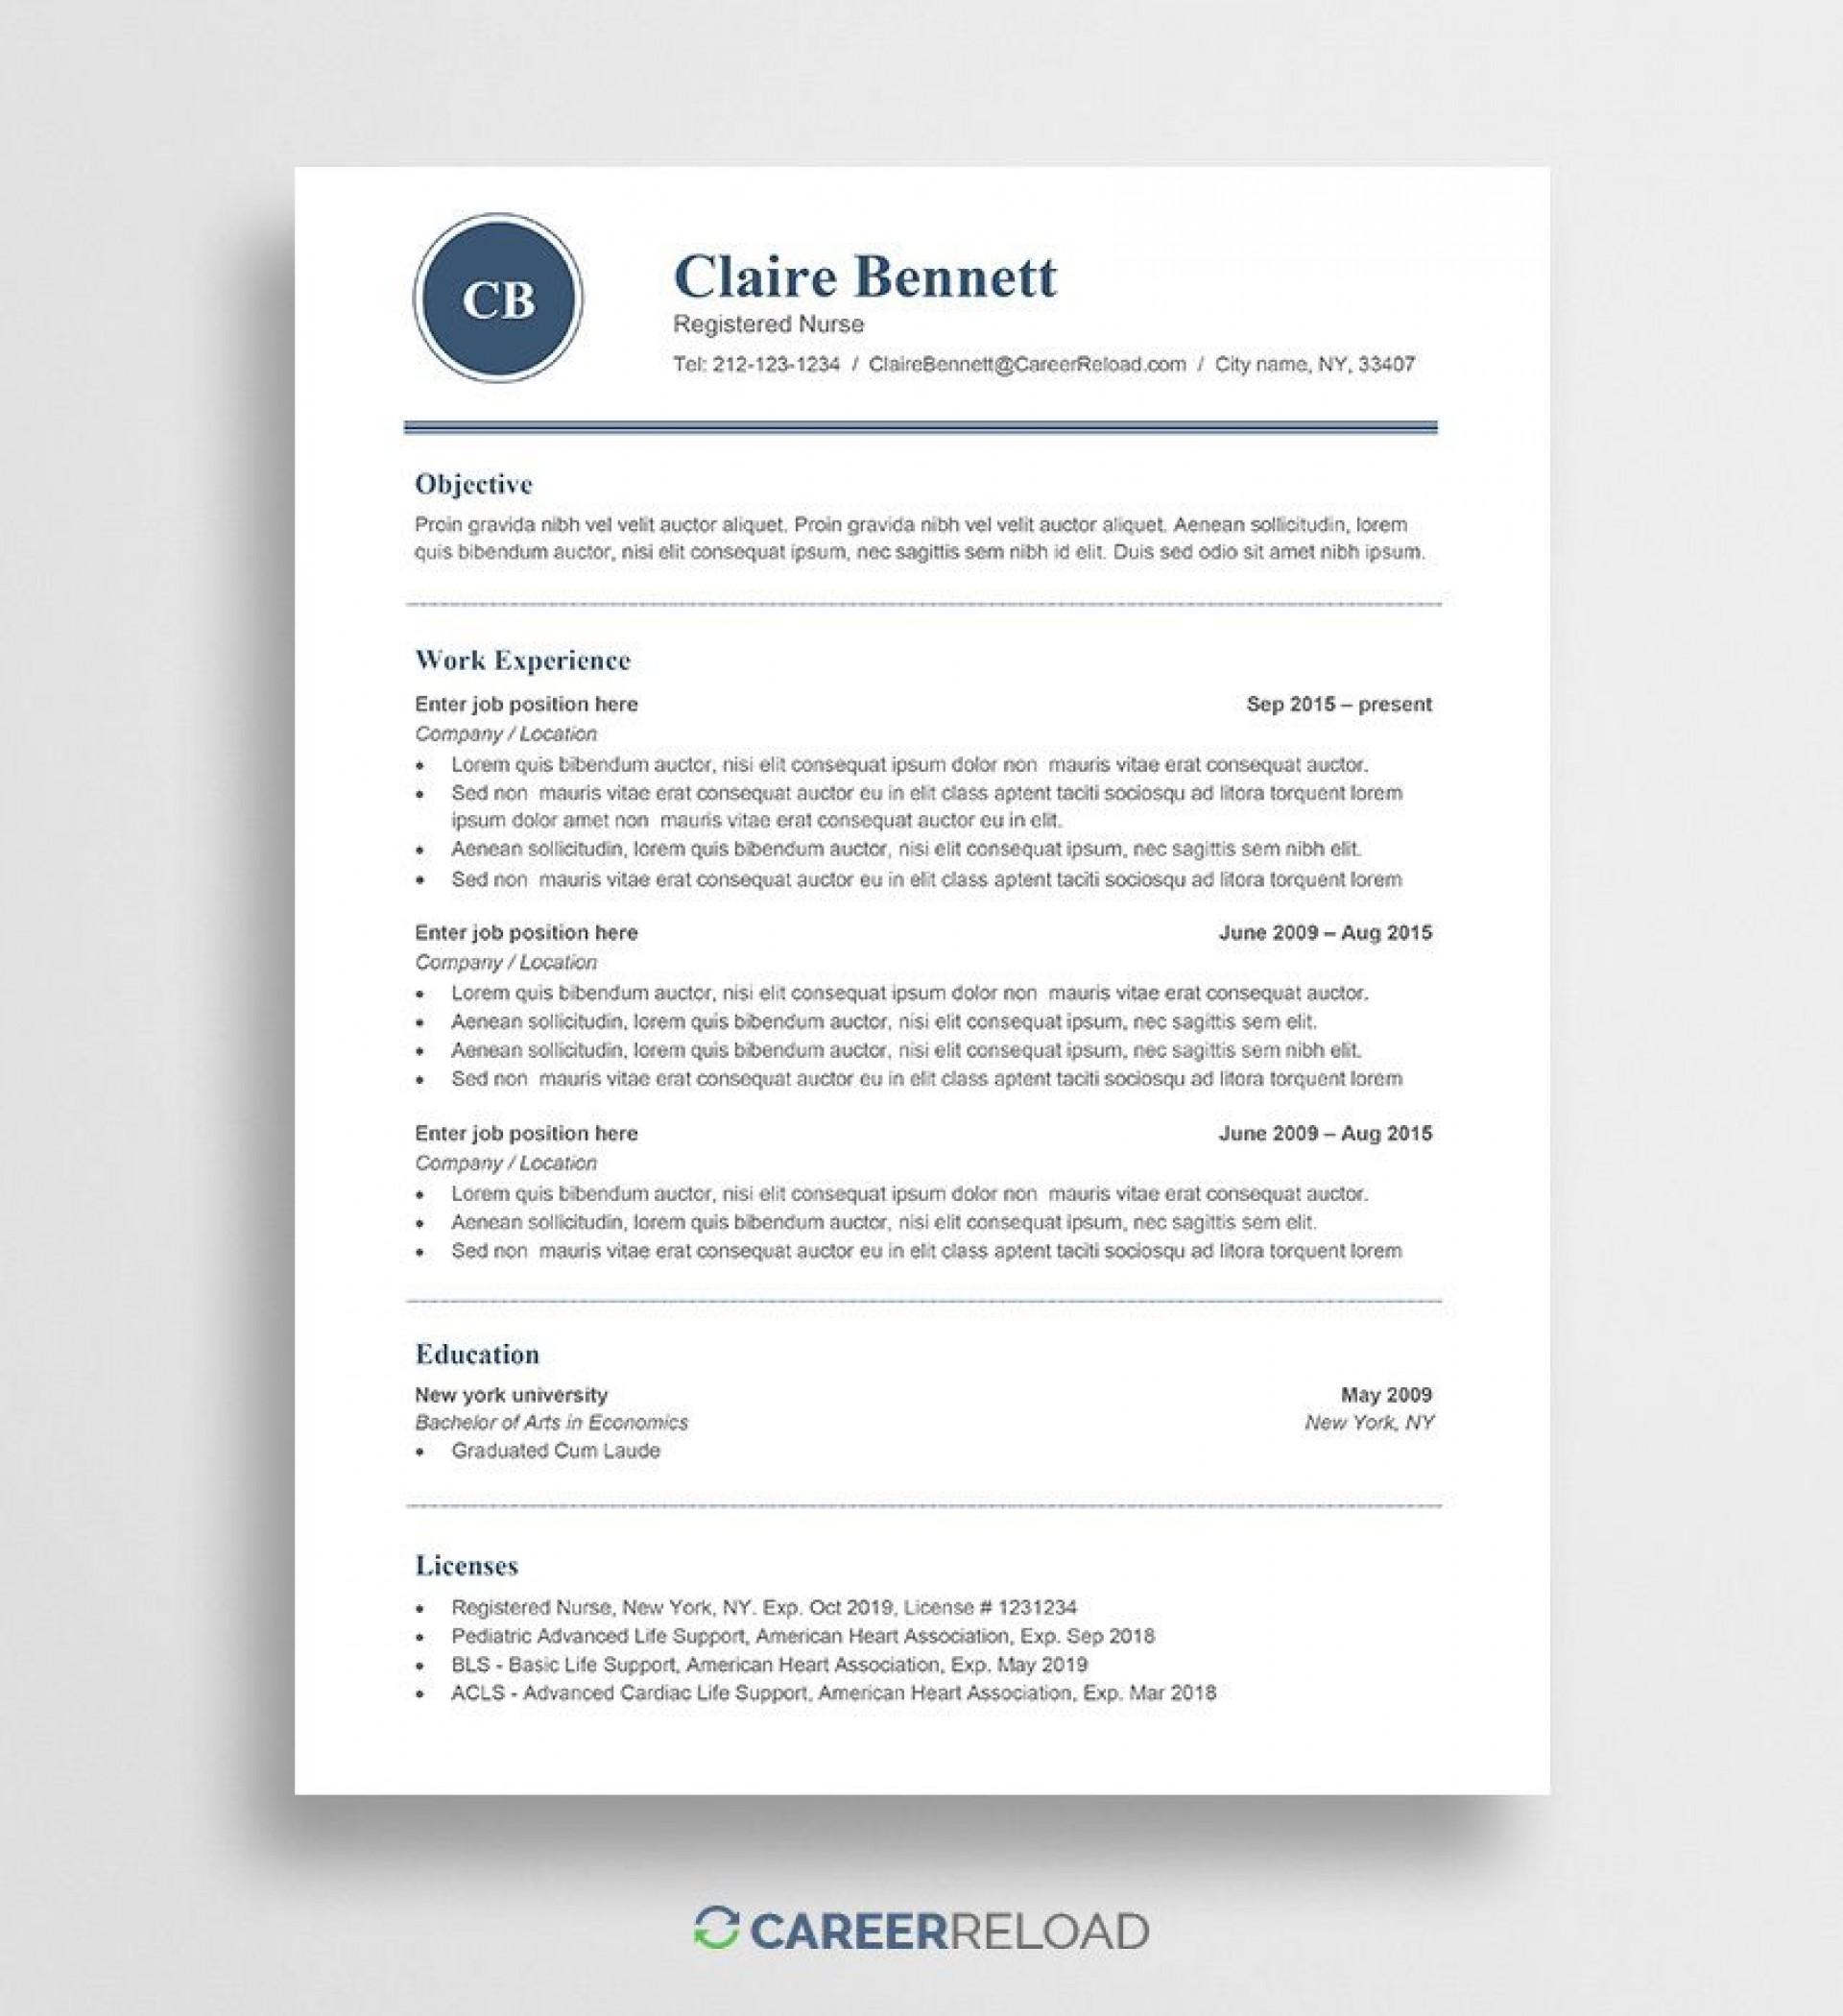 004 Awful Free Resume Template 2015 Idea 1920